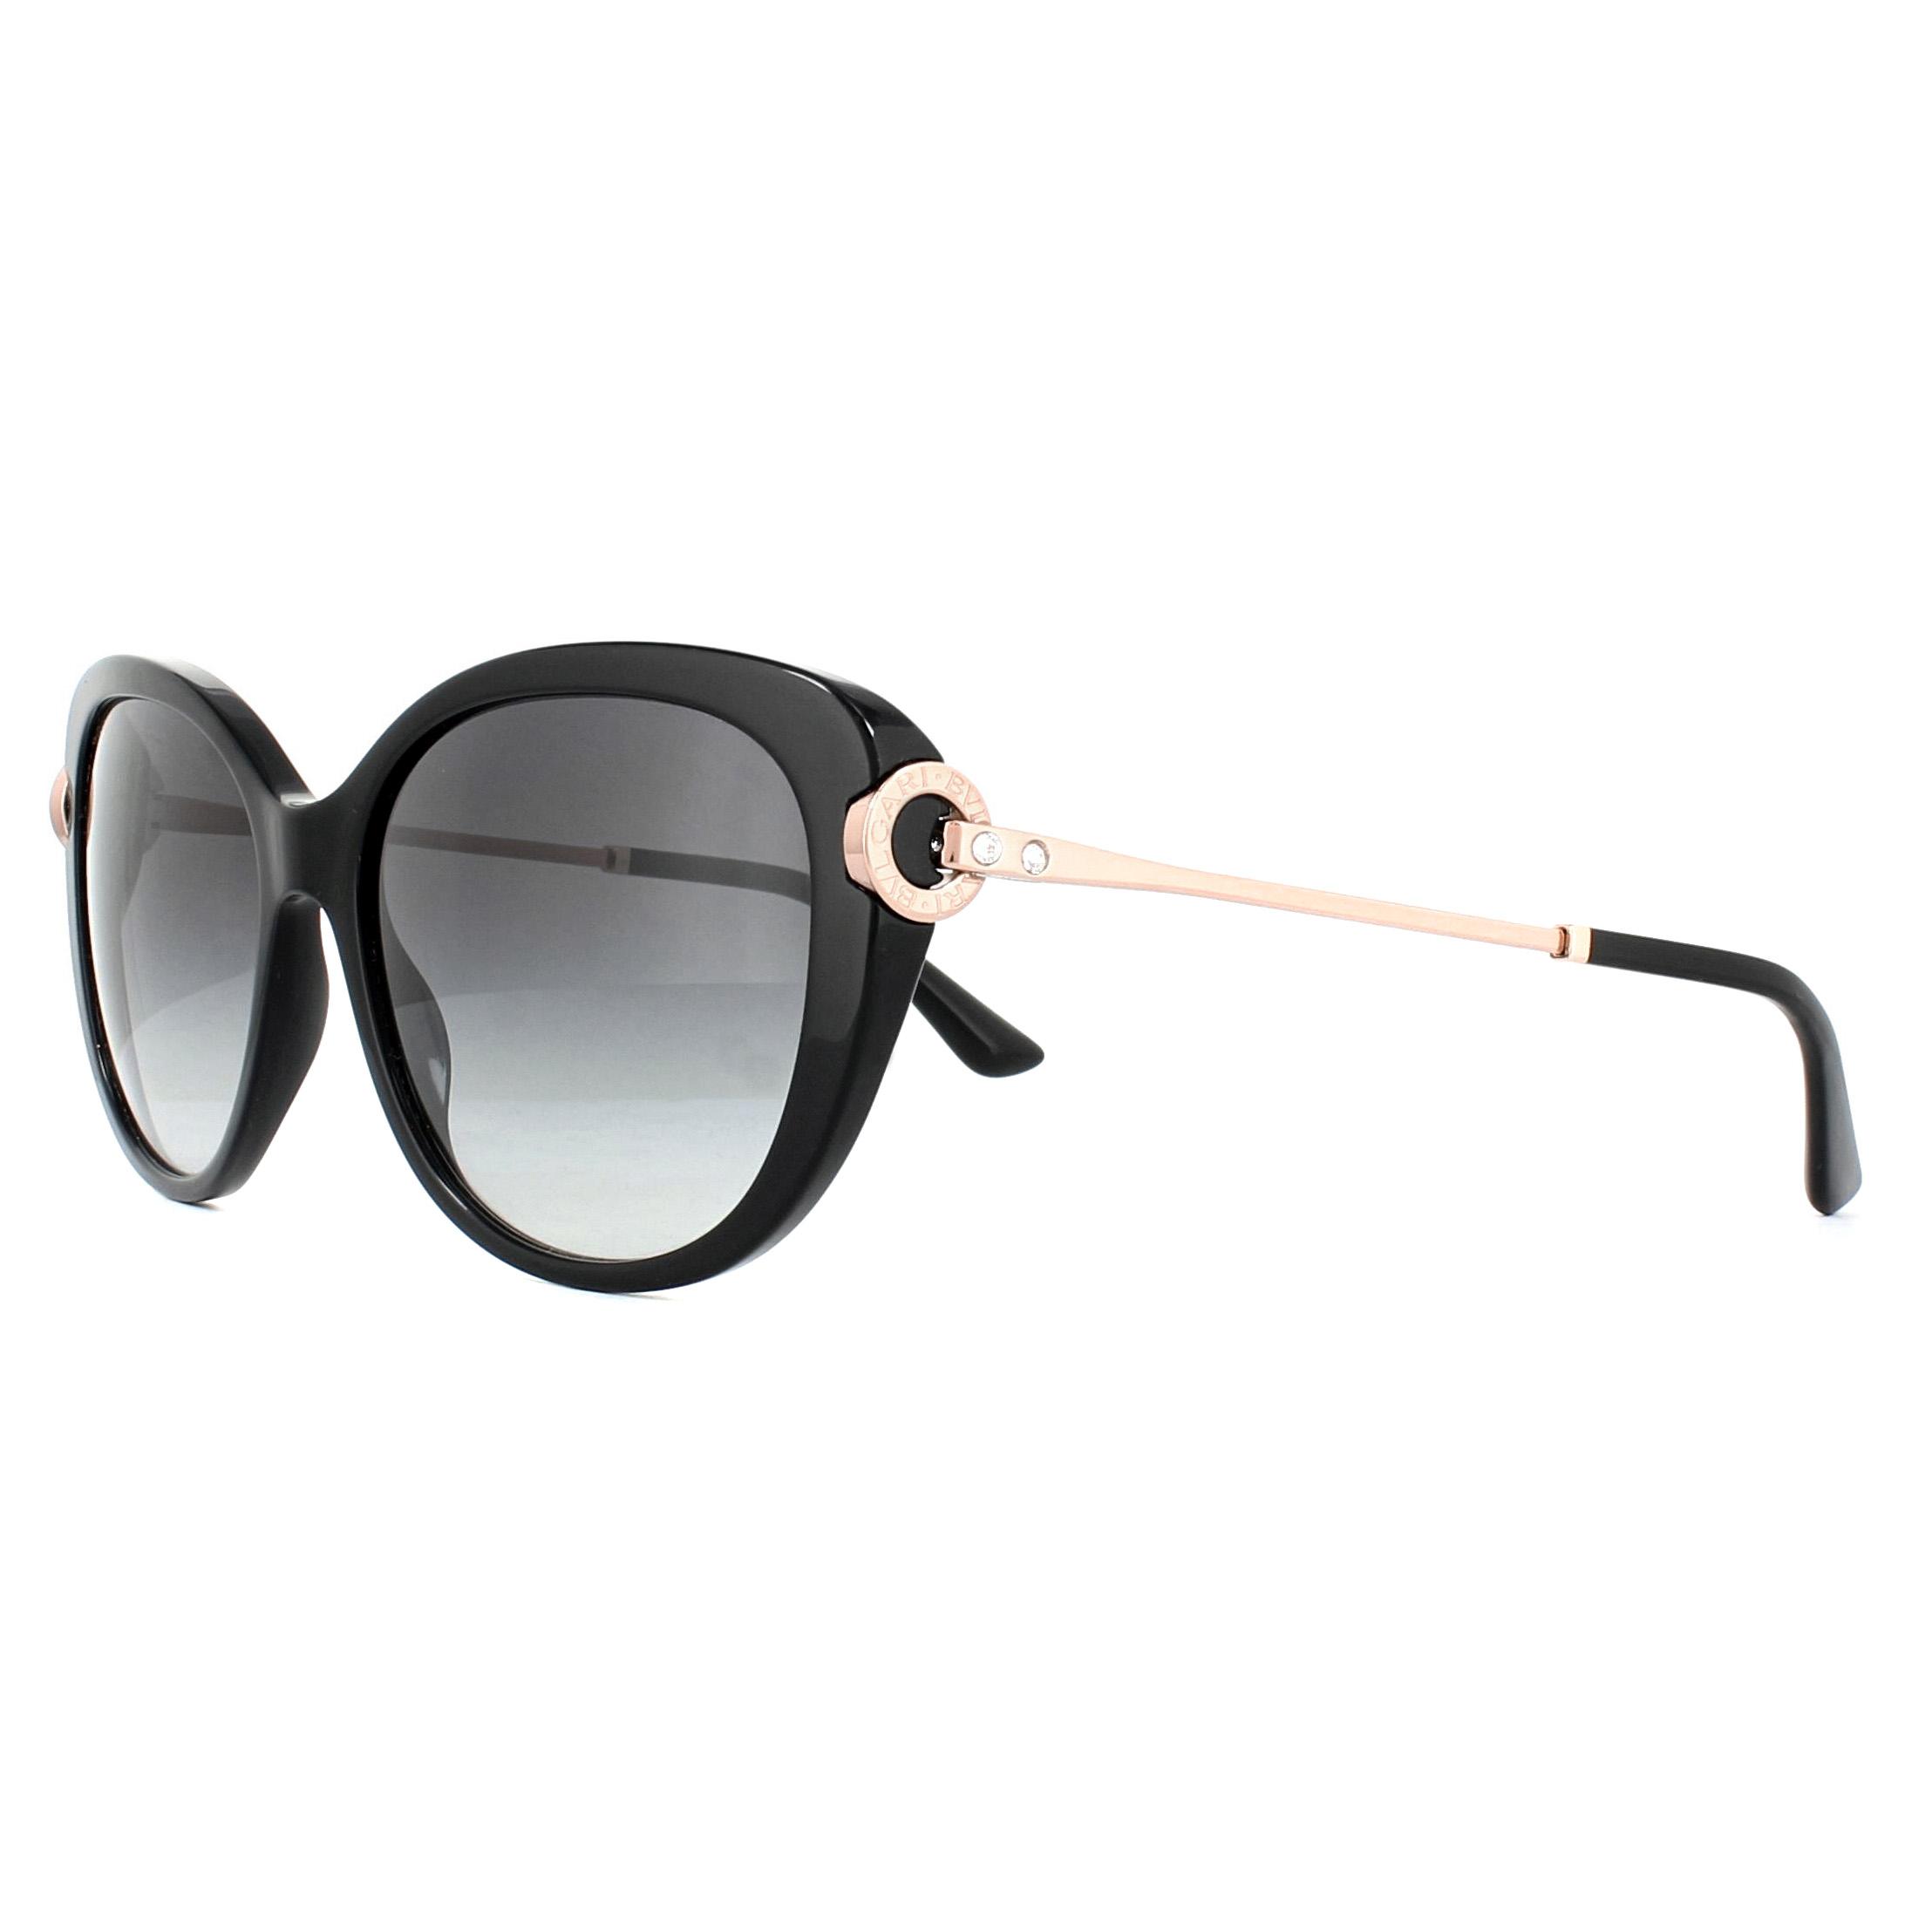 89af2e136168 Sentinel Bvlgari Sunglasses 8194B 501 8G Black Grey Gradient